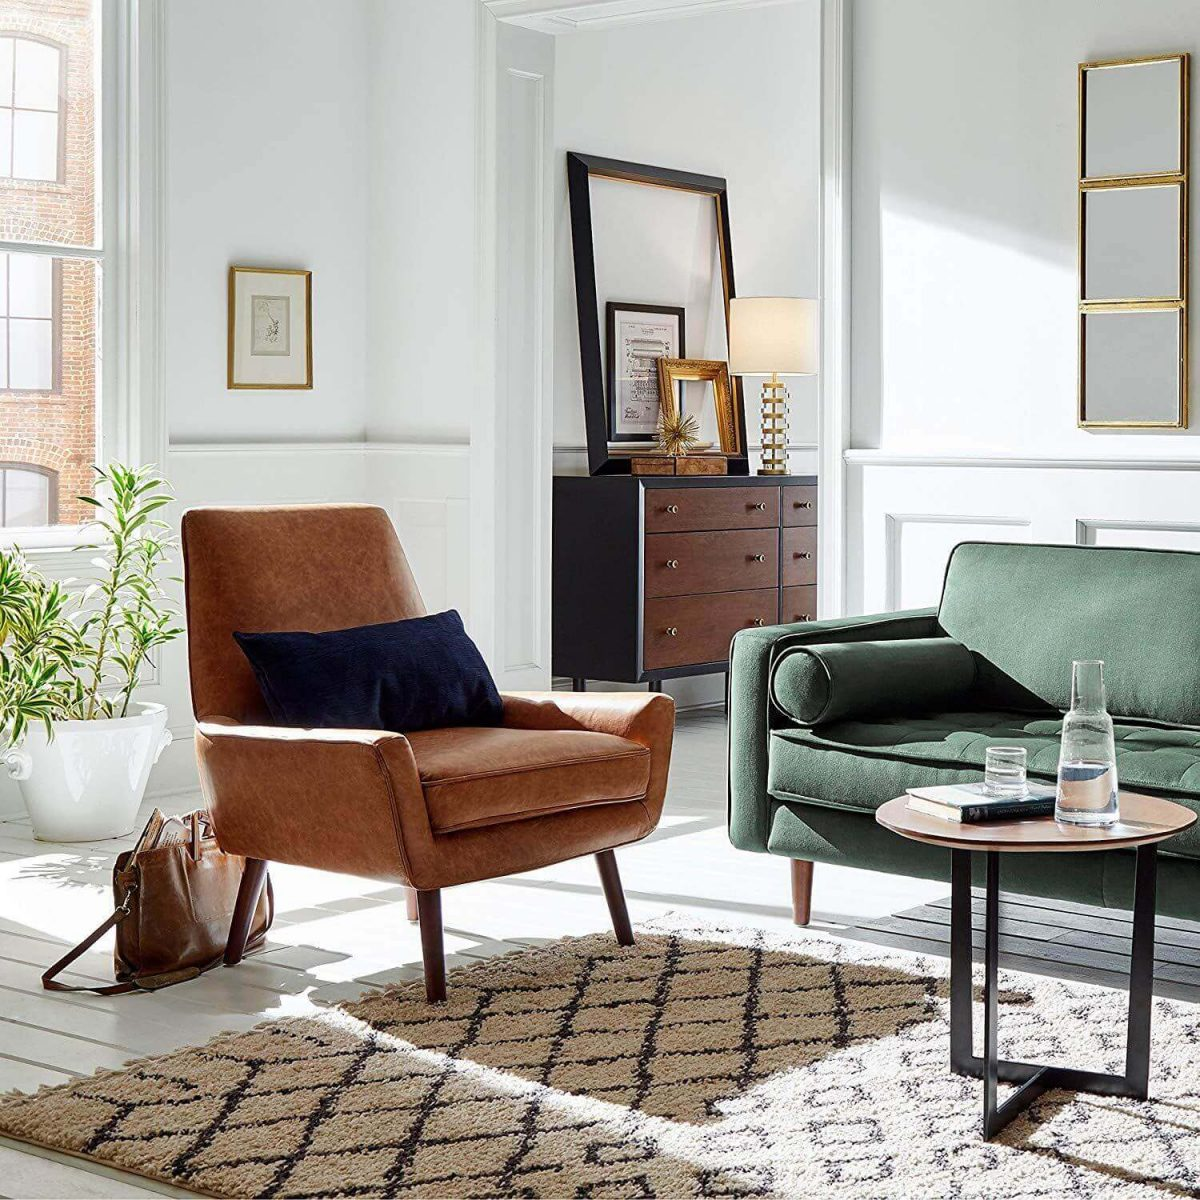 Furniture drop business opportunities